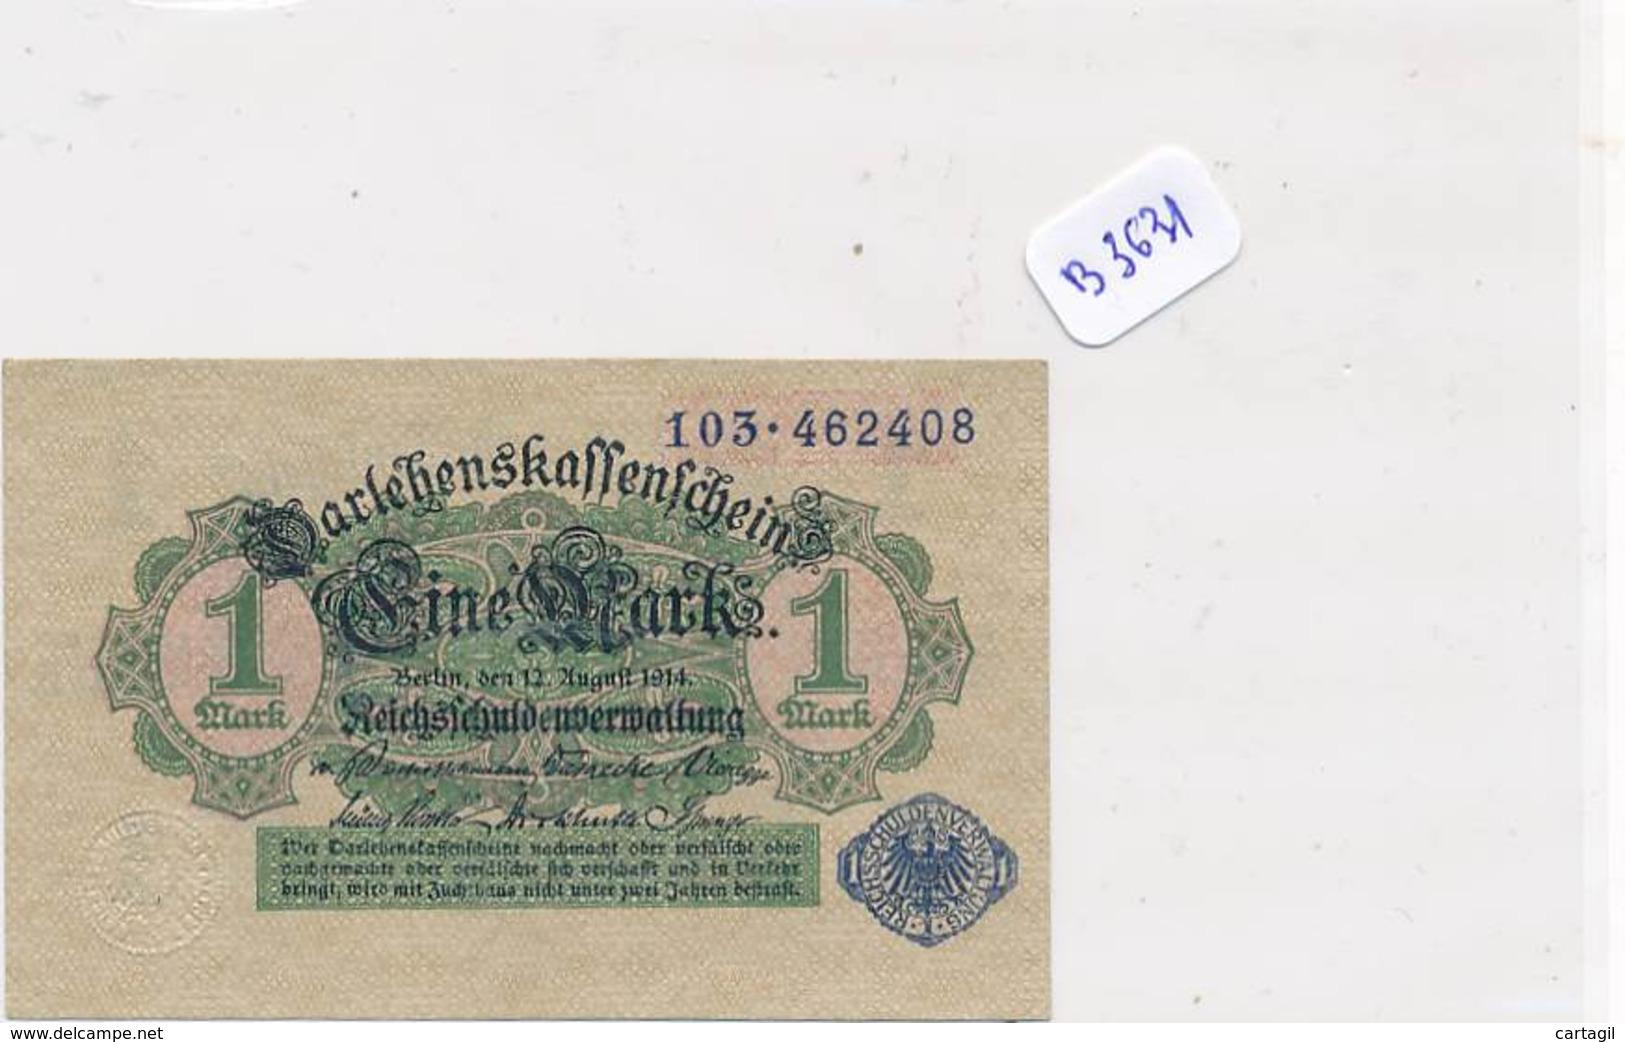 Numismatique -B3631 -Allemagne -1Mark Darlehnskassenshein 1914 ( Catégorie,  Nature état ... Scans)-Envoi Gratuit - [ 2] 1871-1918 : Impero Tedesco